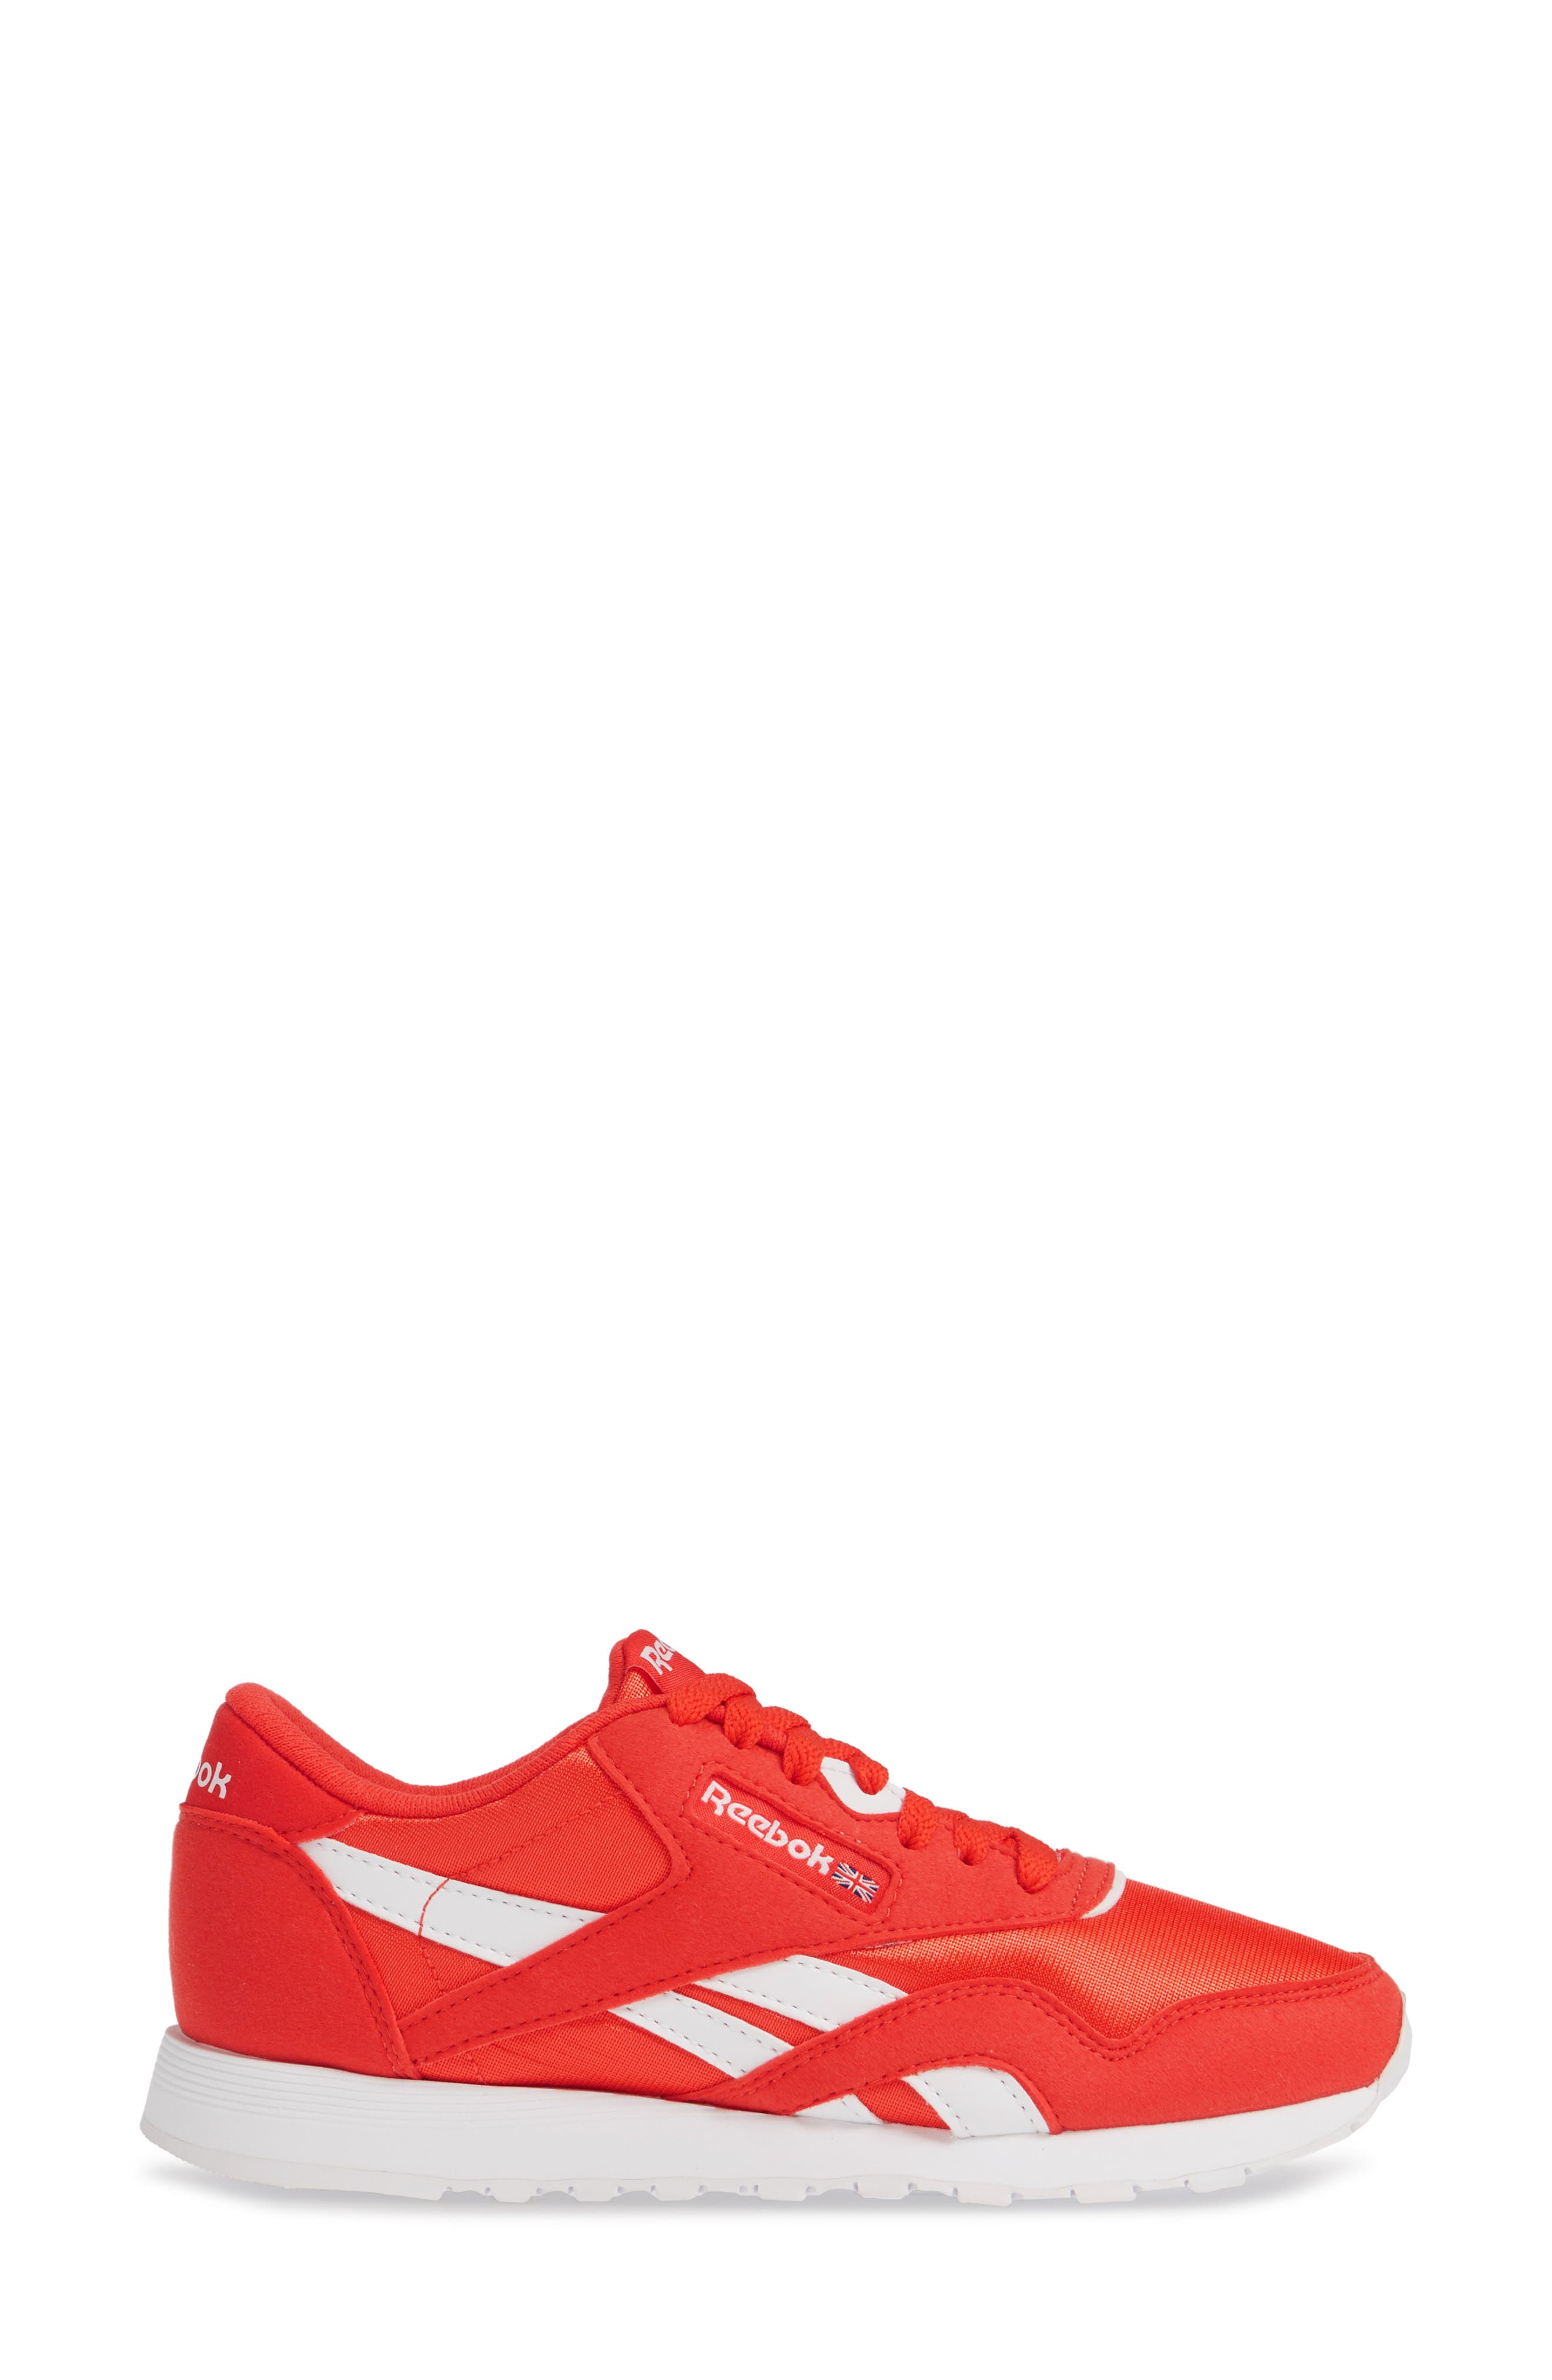 ,                             Classic Nylon Sneaker,                             Alternate thumbnail 24, color,                             601